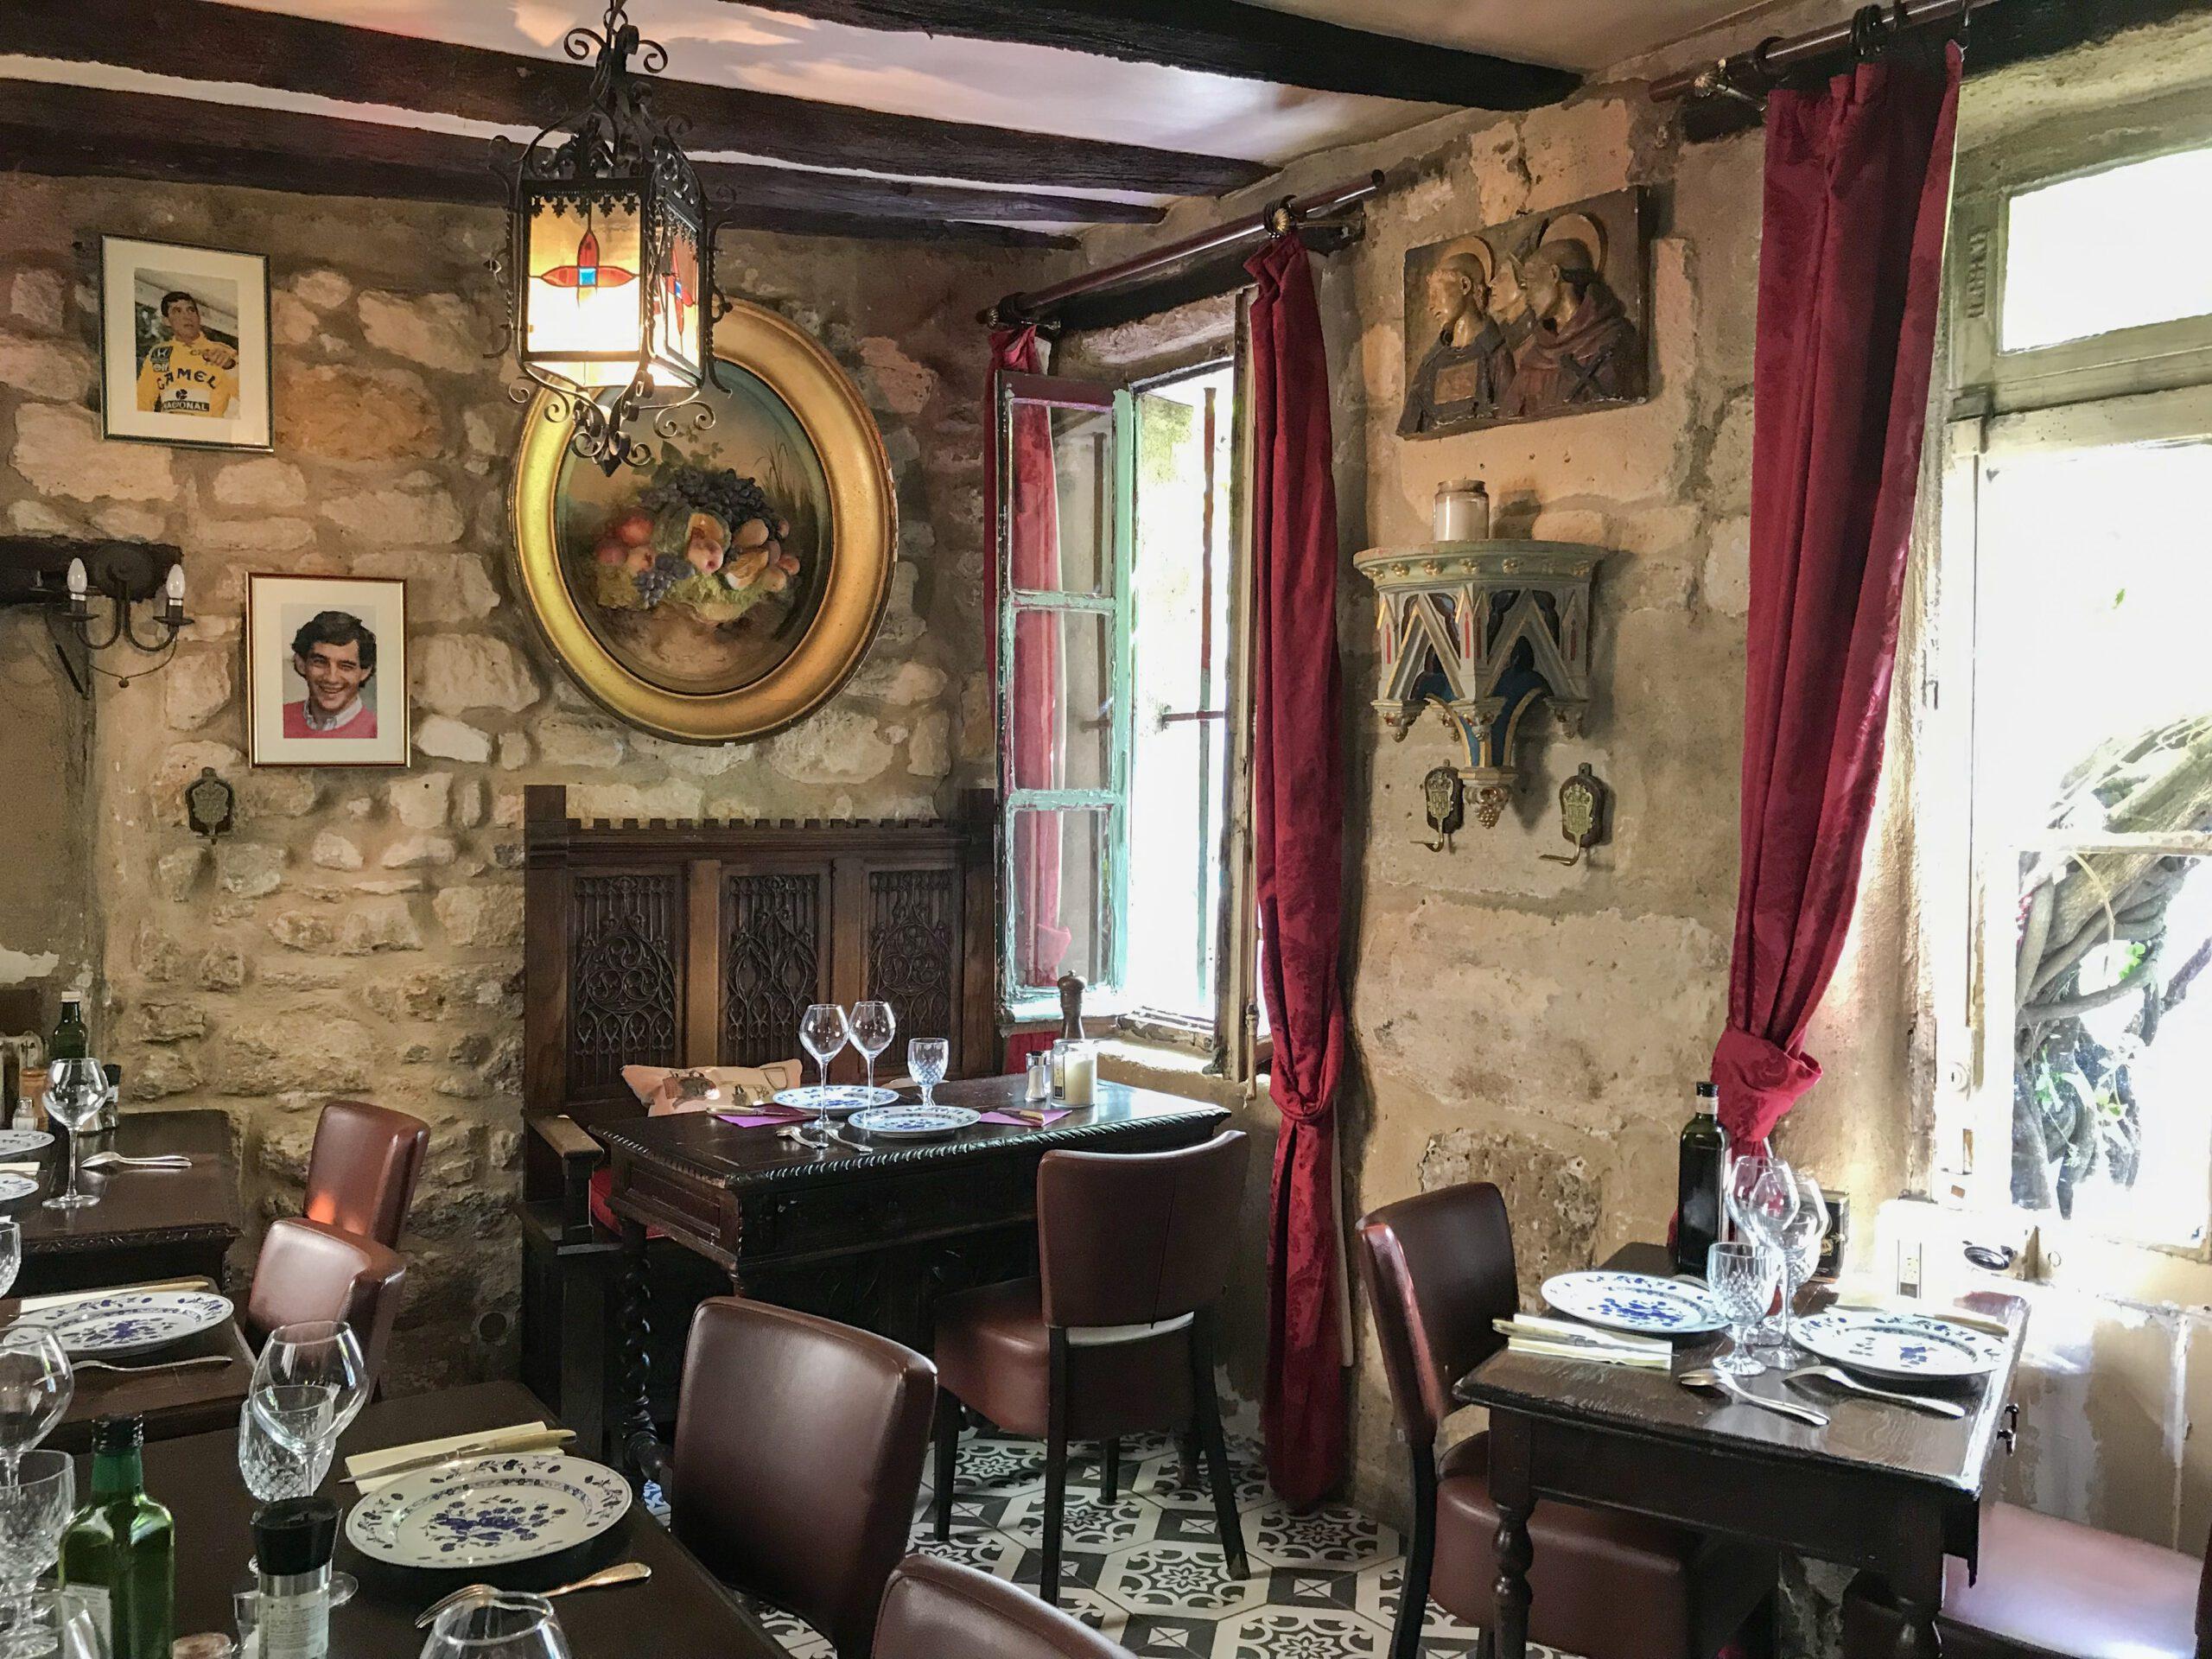 parijs au vieux paris inrichting restaurant 18e eeuw